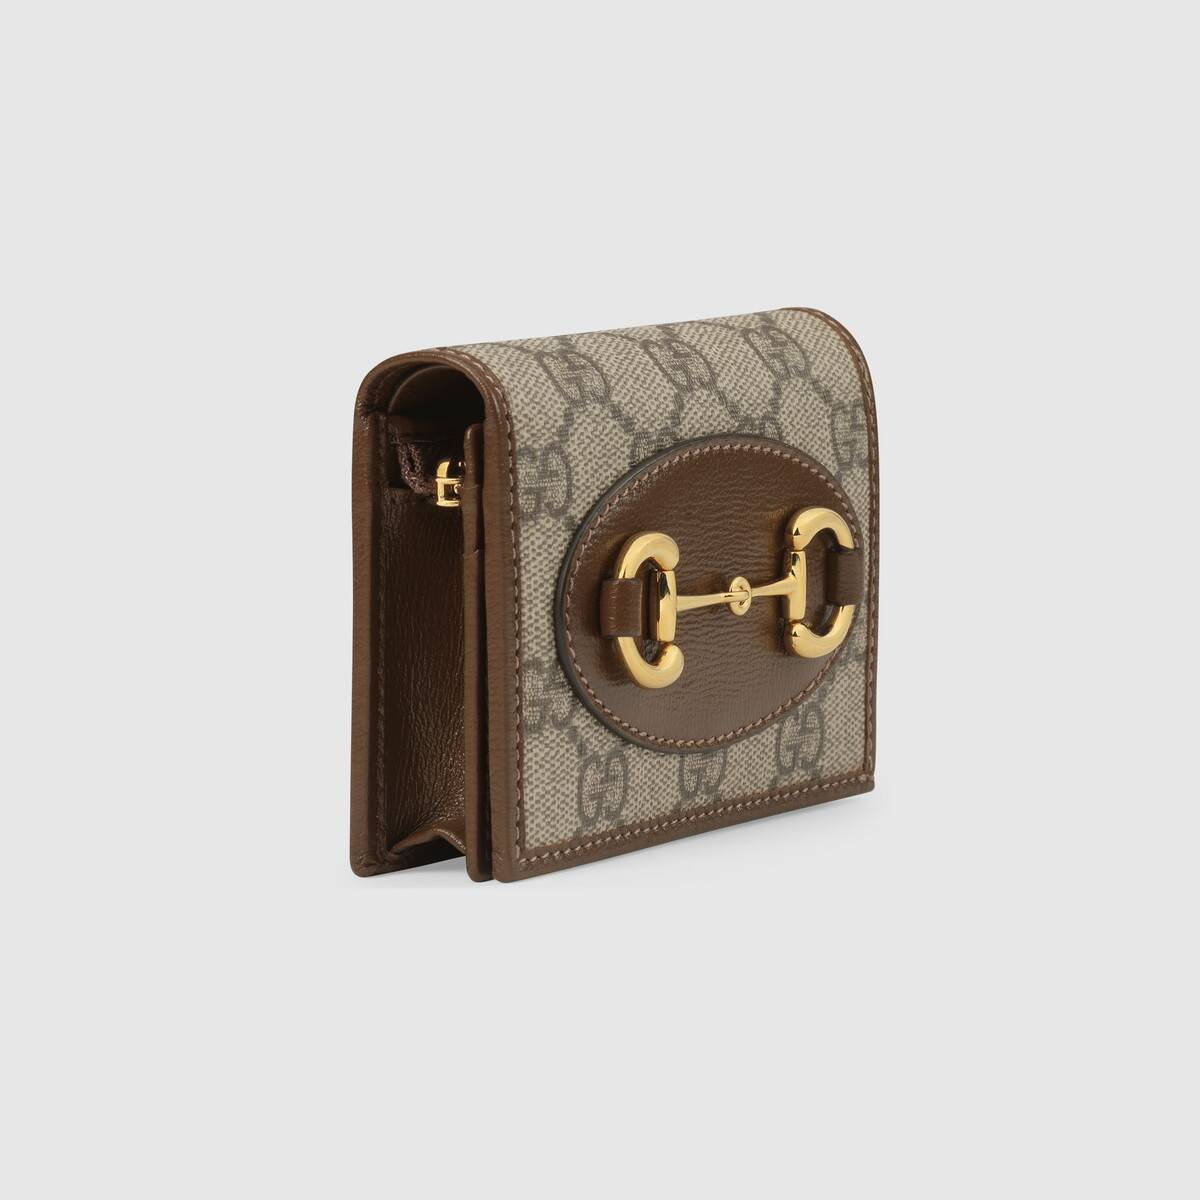 621887_92TCG_8563_004_080_0000_Light-Gucci-Horsebit-1955-card-case-wallet (1).jpg